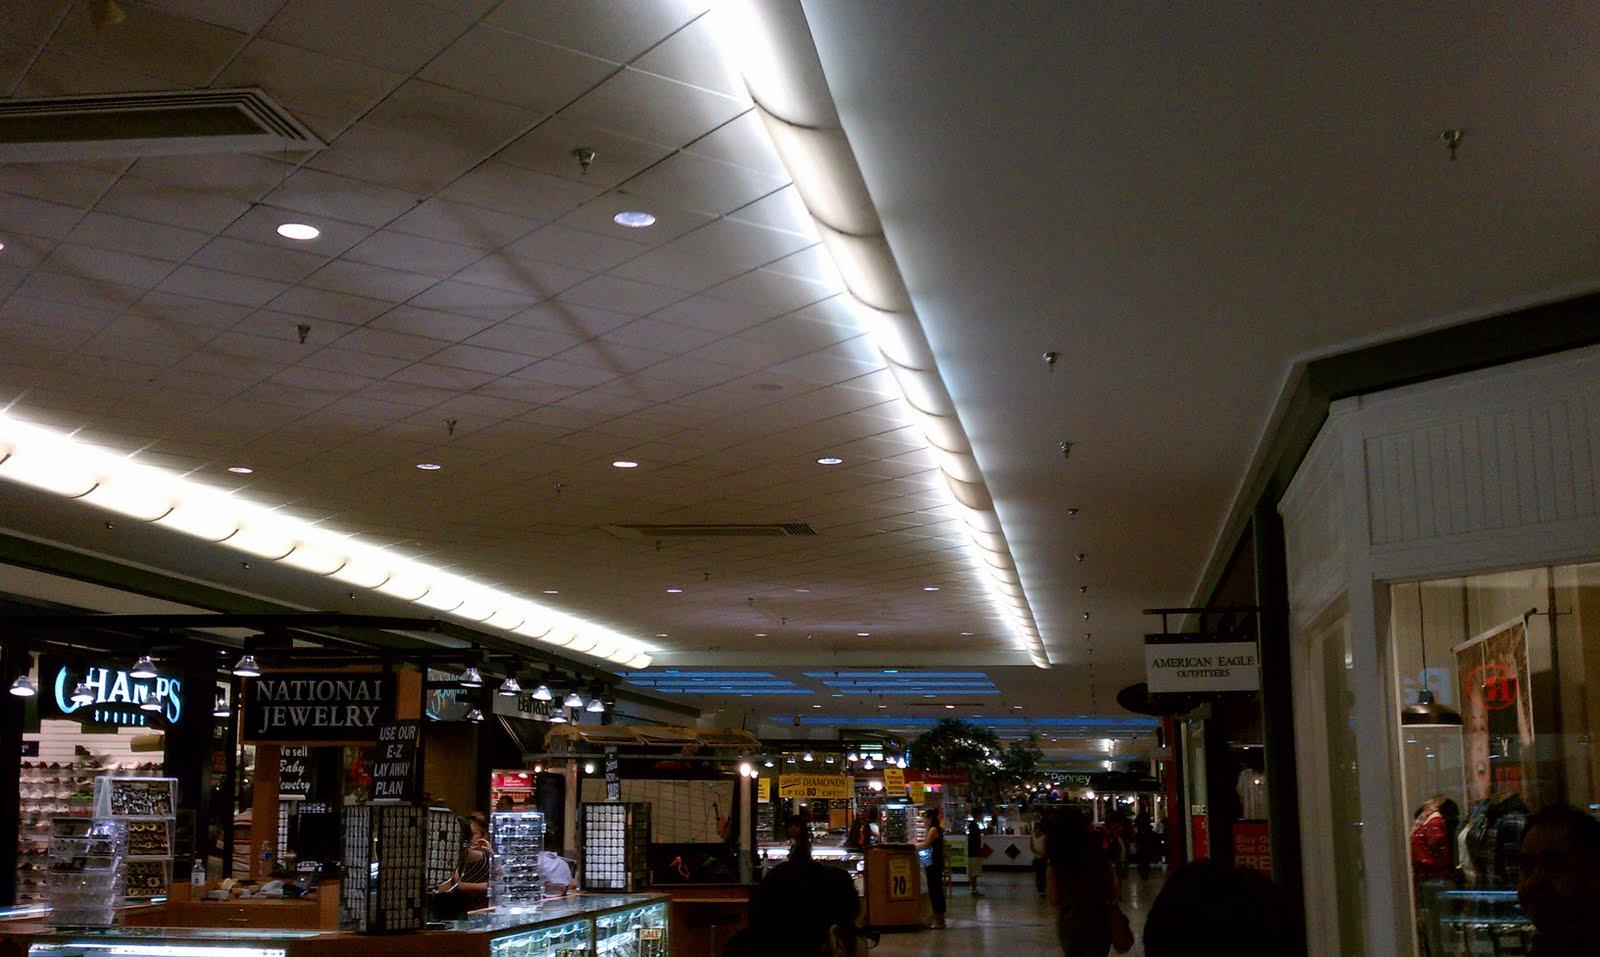 The Louisiana And Texas Retail Blogspot South Park Mall